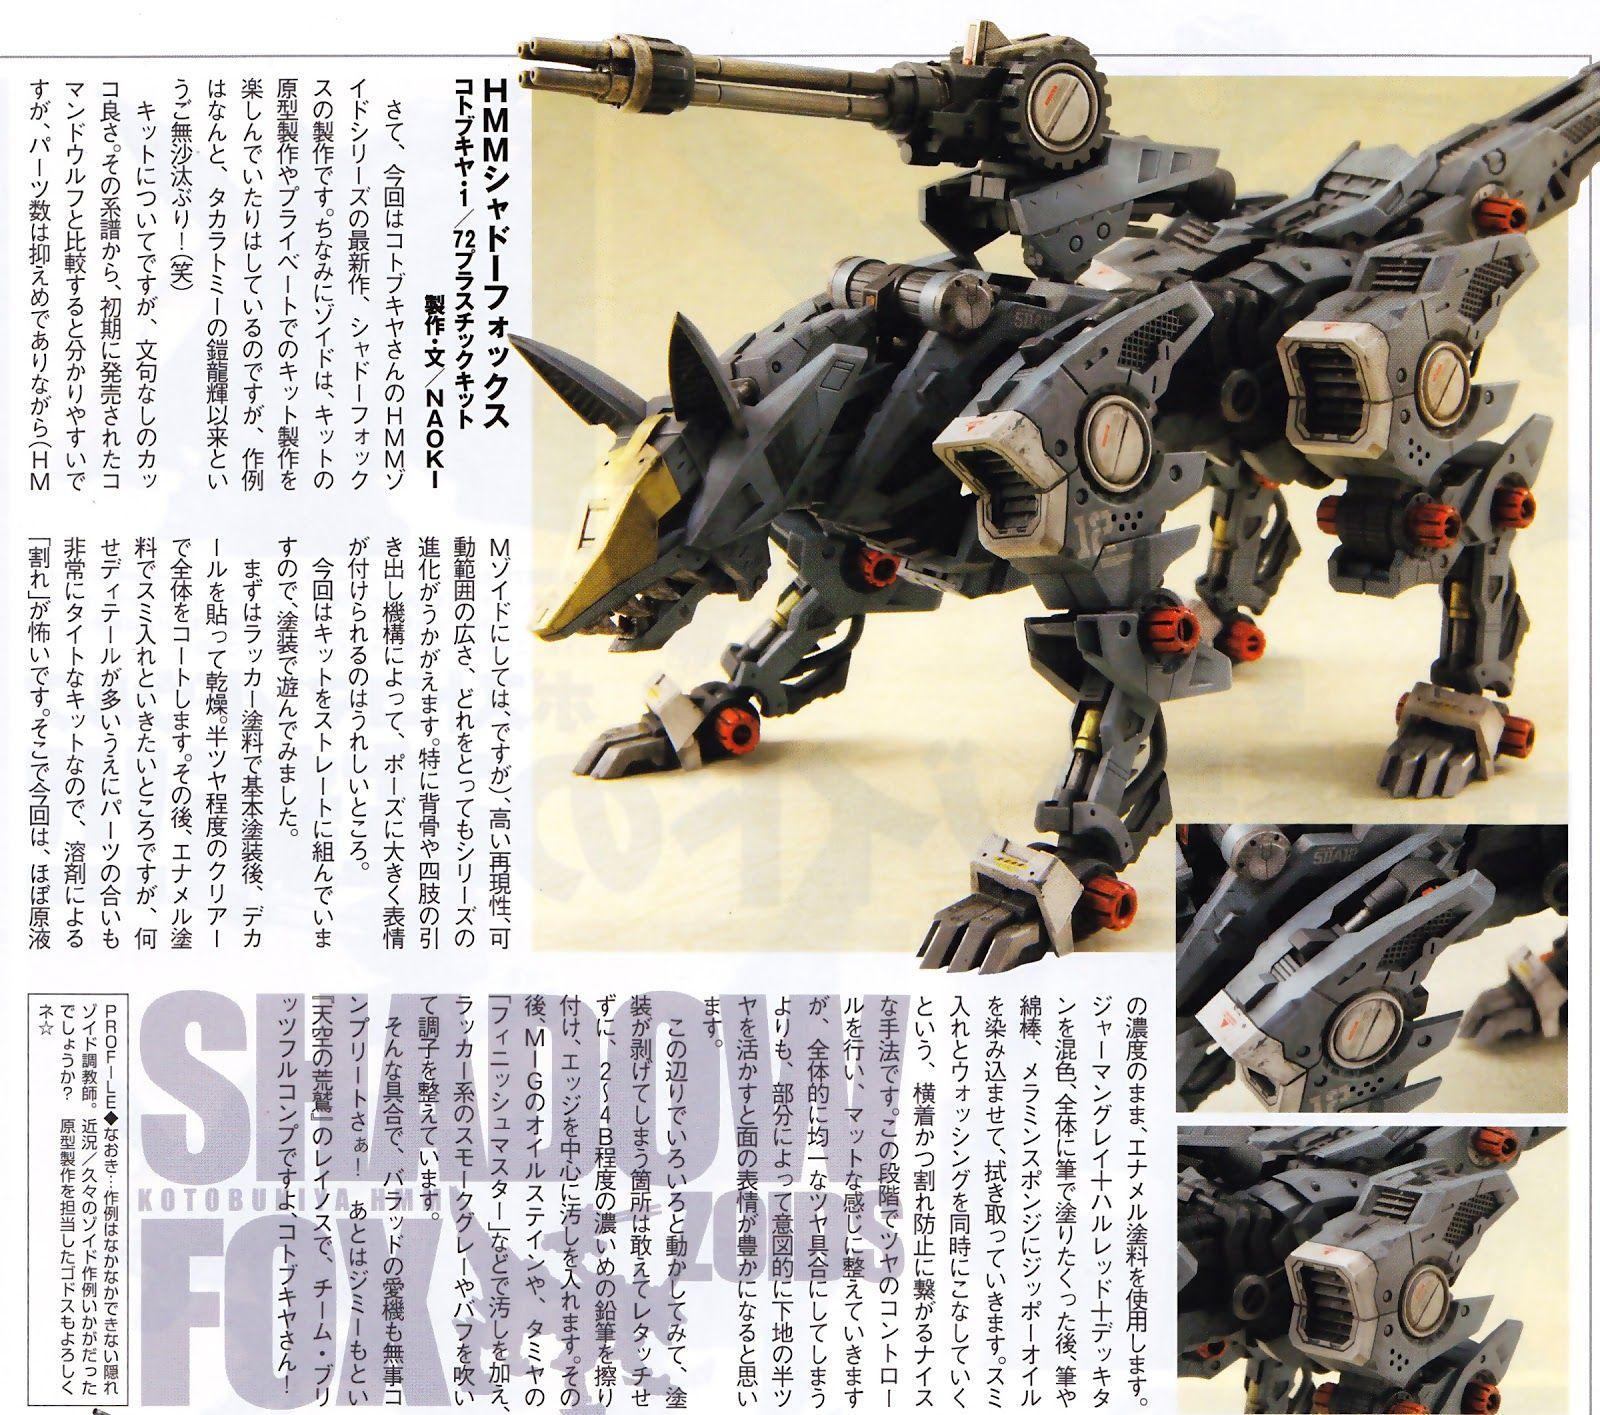 MECHA GUY: HMM ZOIDS 1/72 RZ-046 Shadow Fox - Painted Build